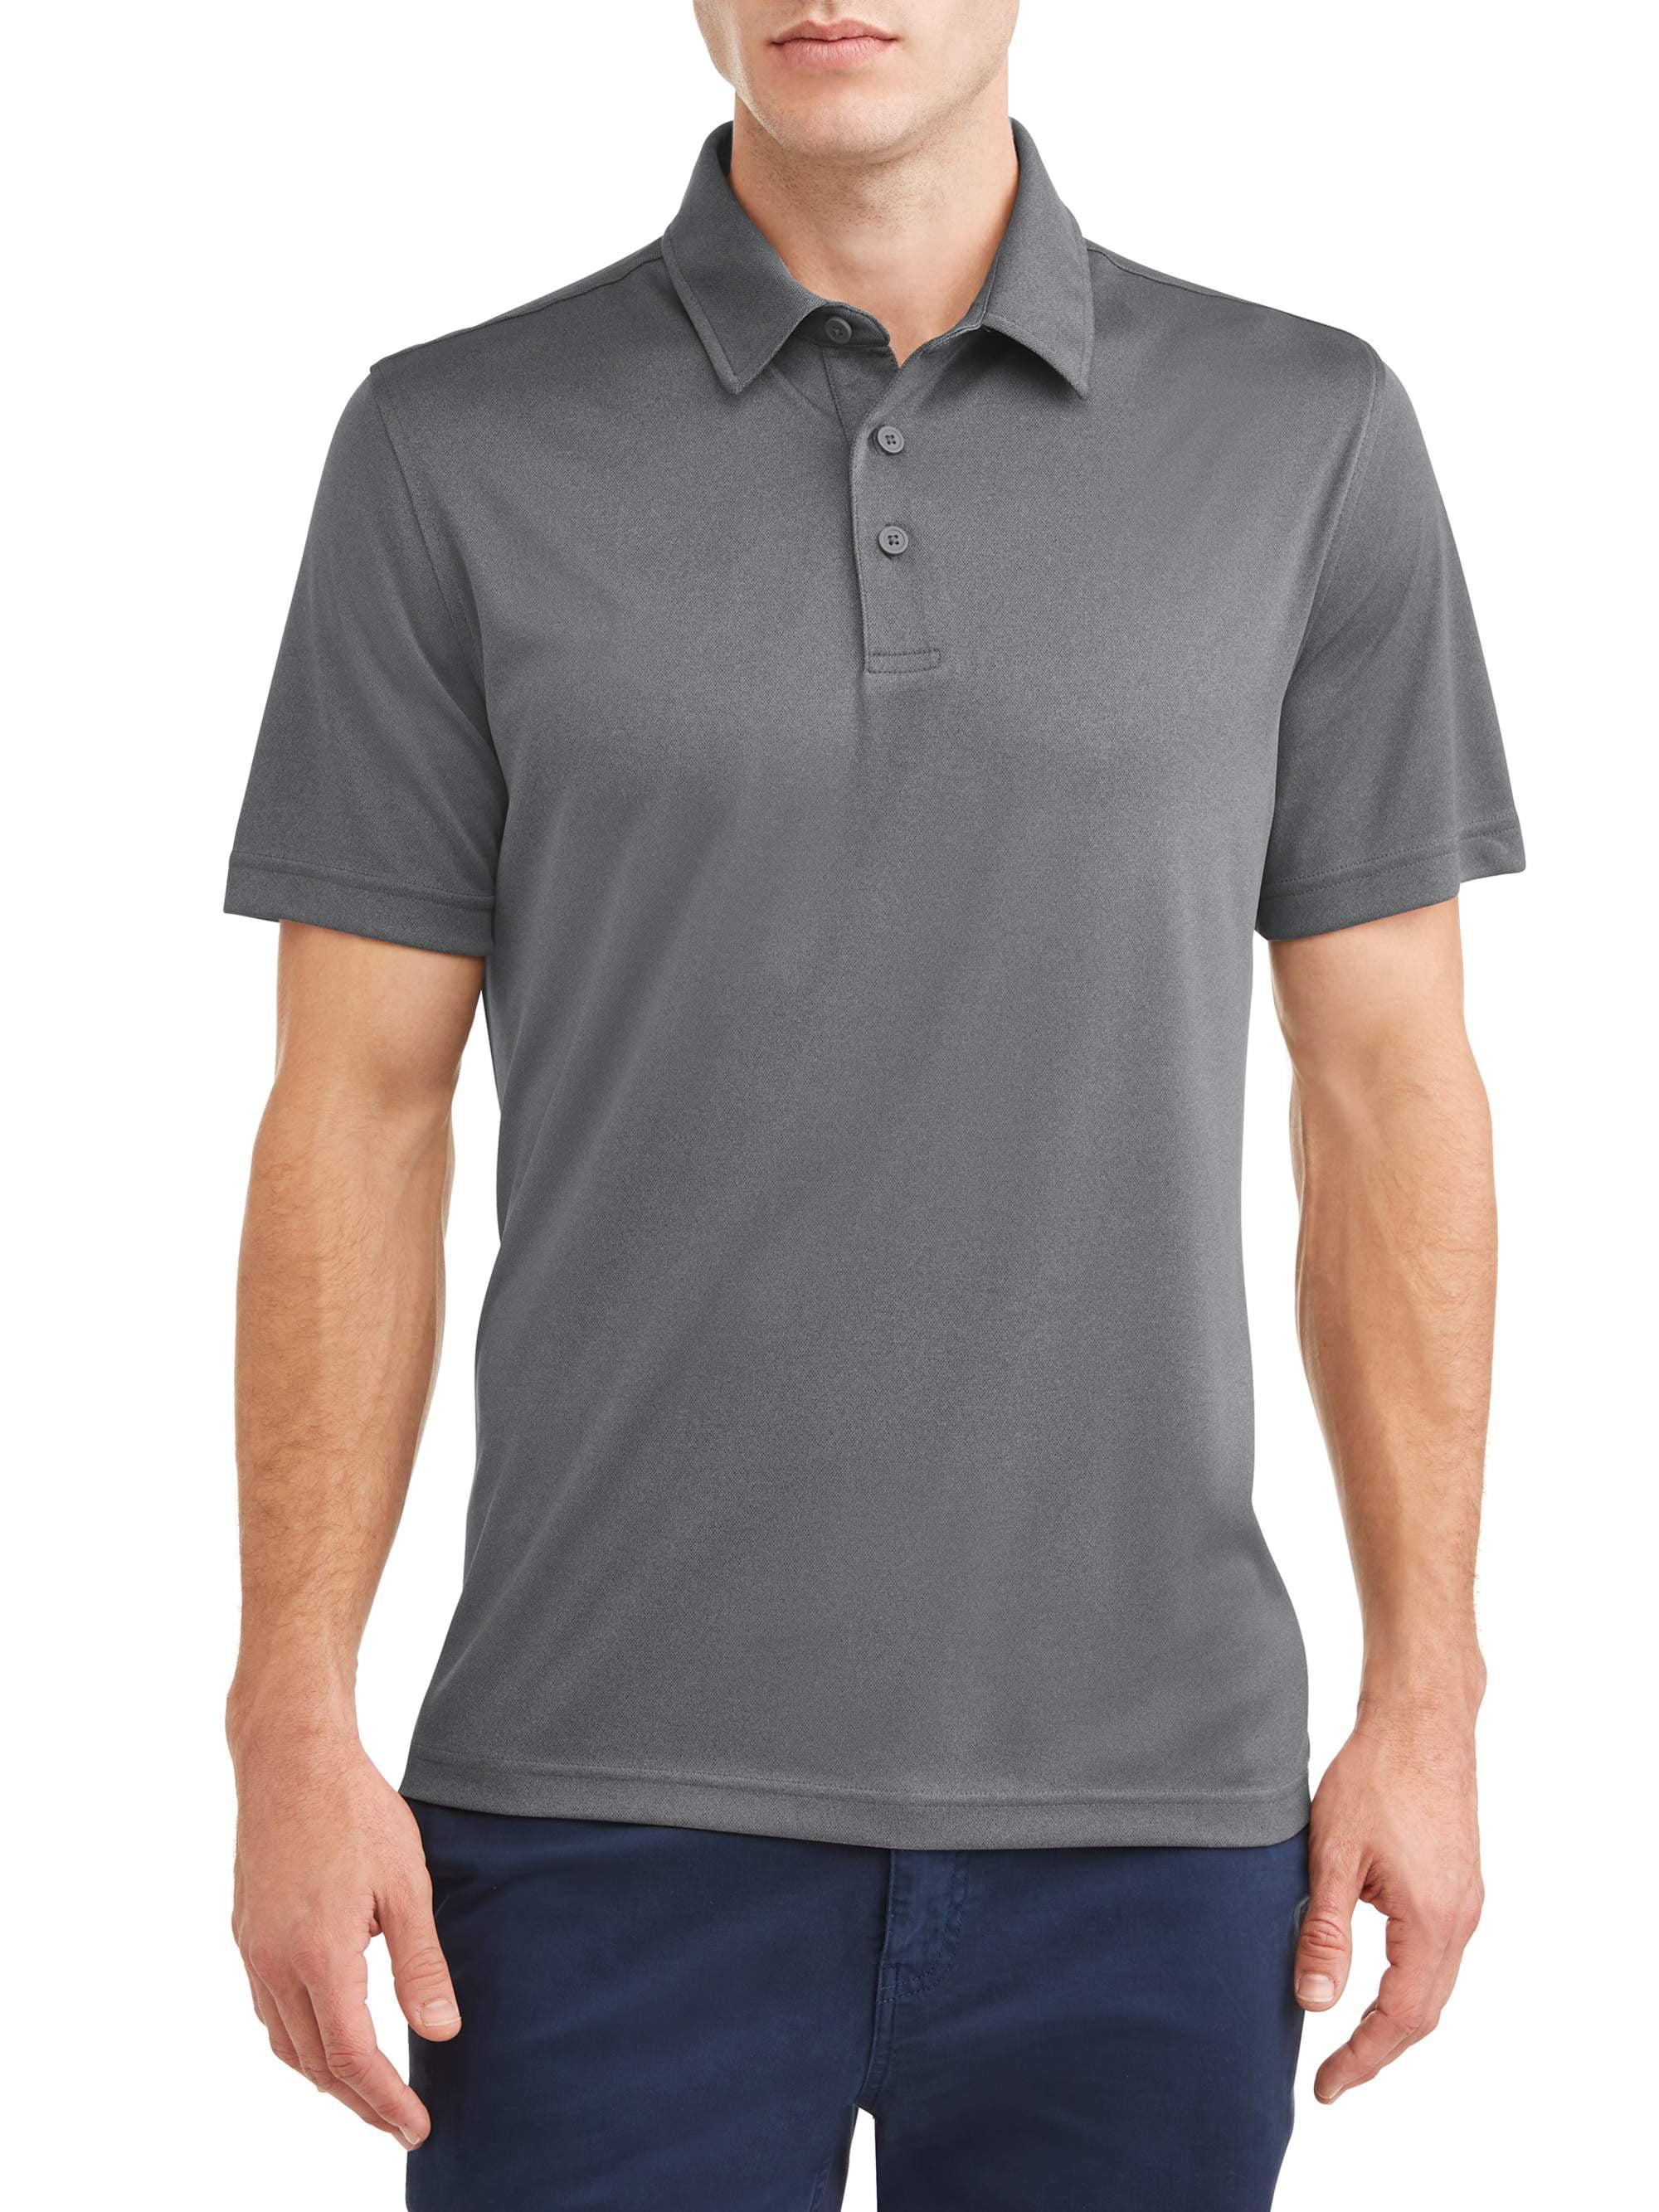 GEORGE - George Men's Polo Shirt - Walmart.com